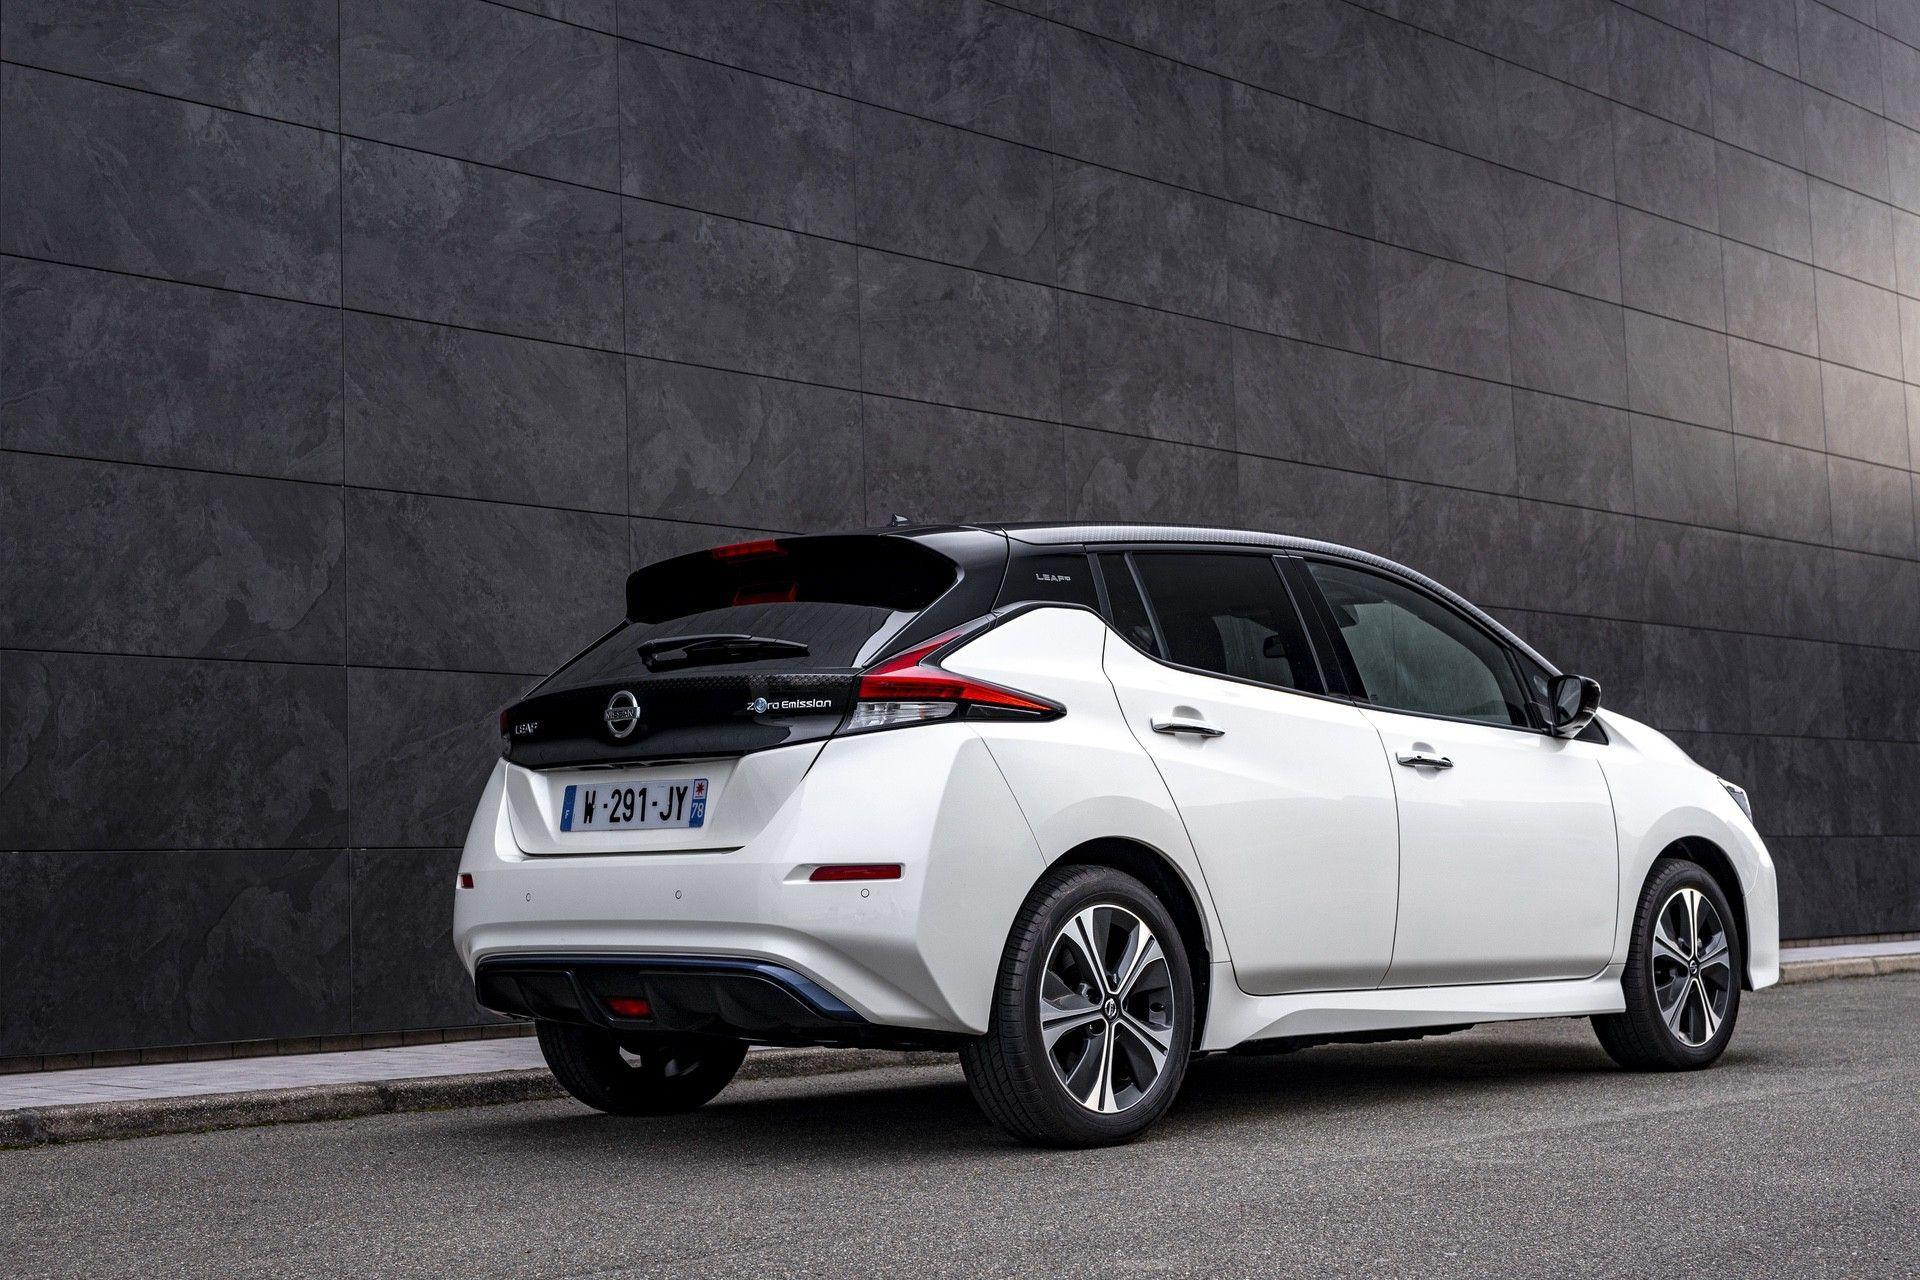 Nissan_Leaf10_special_edition-0009